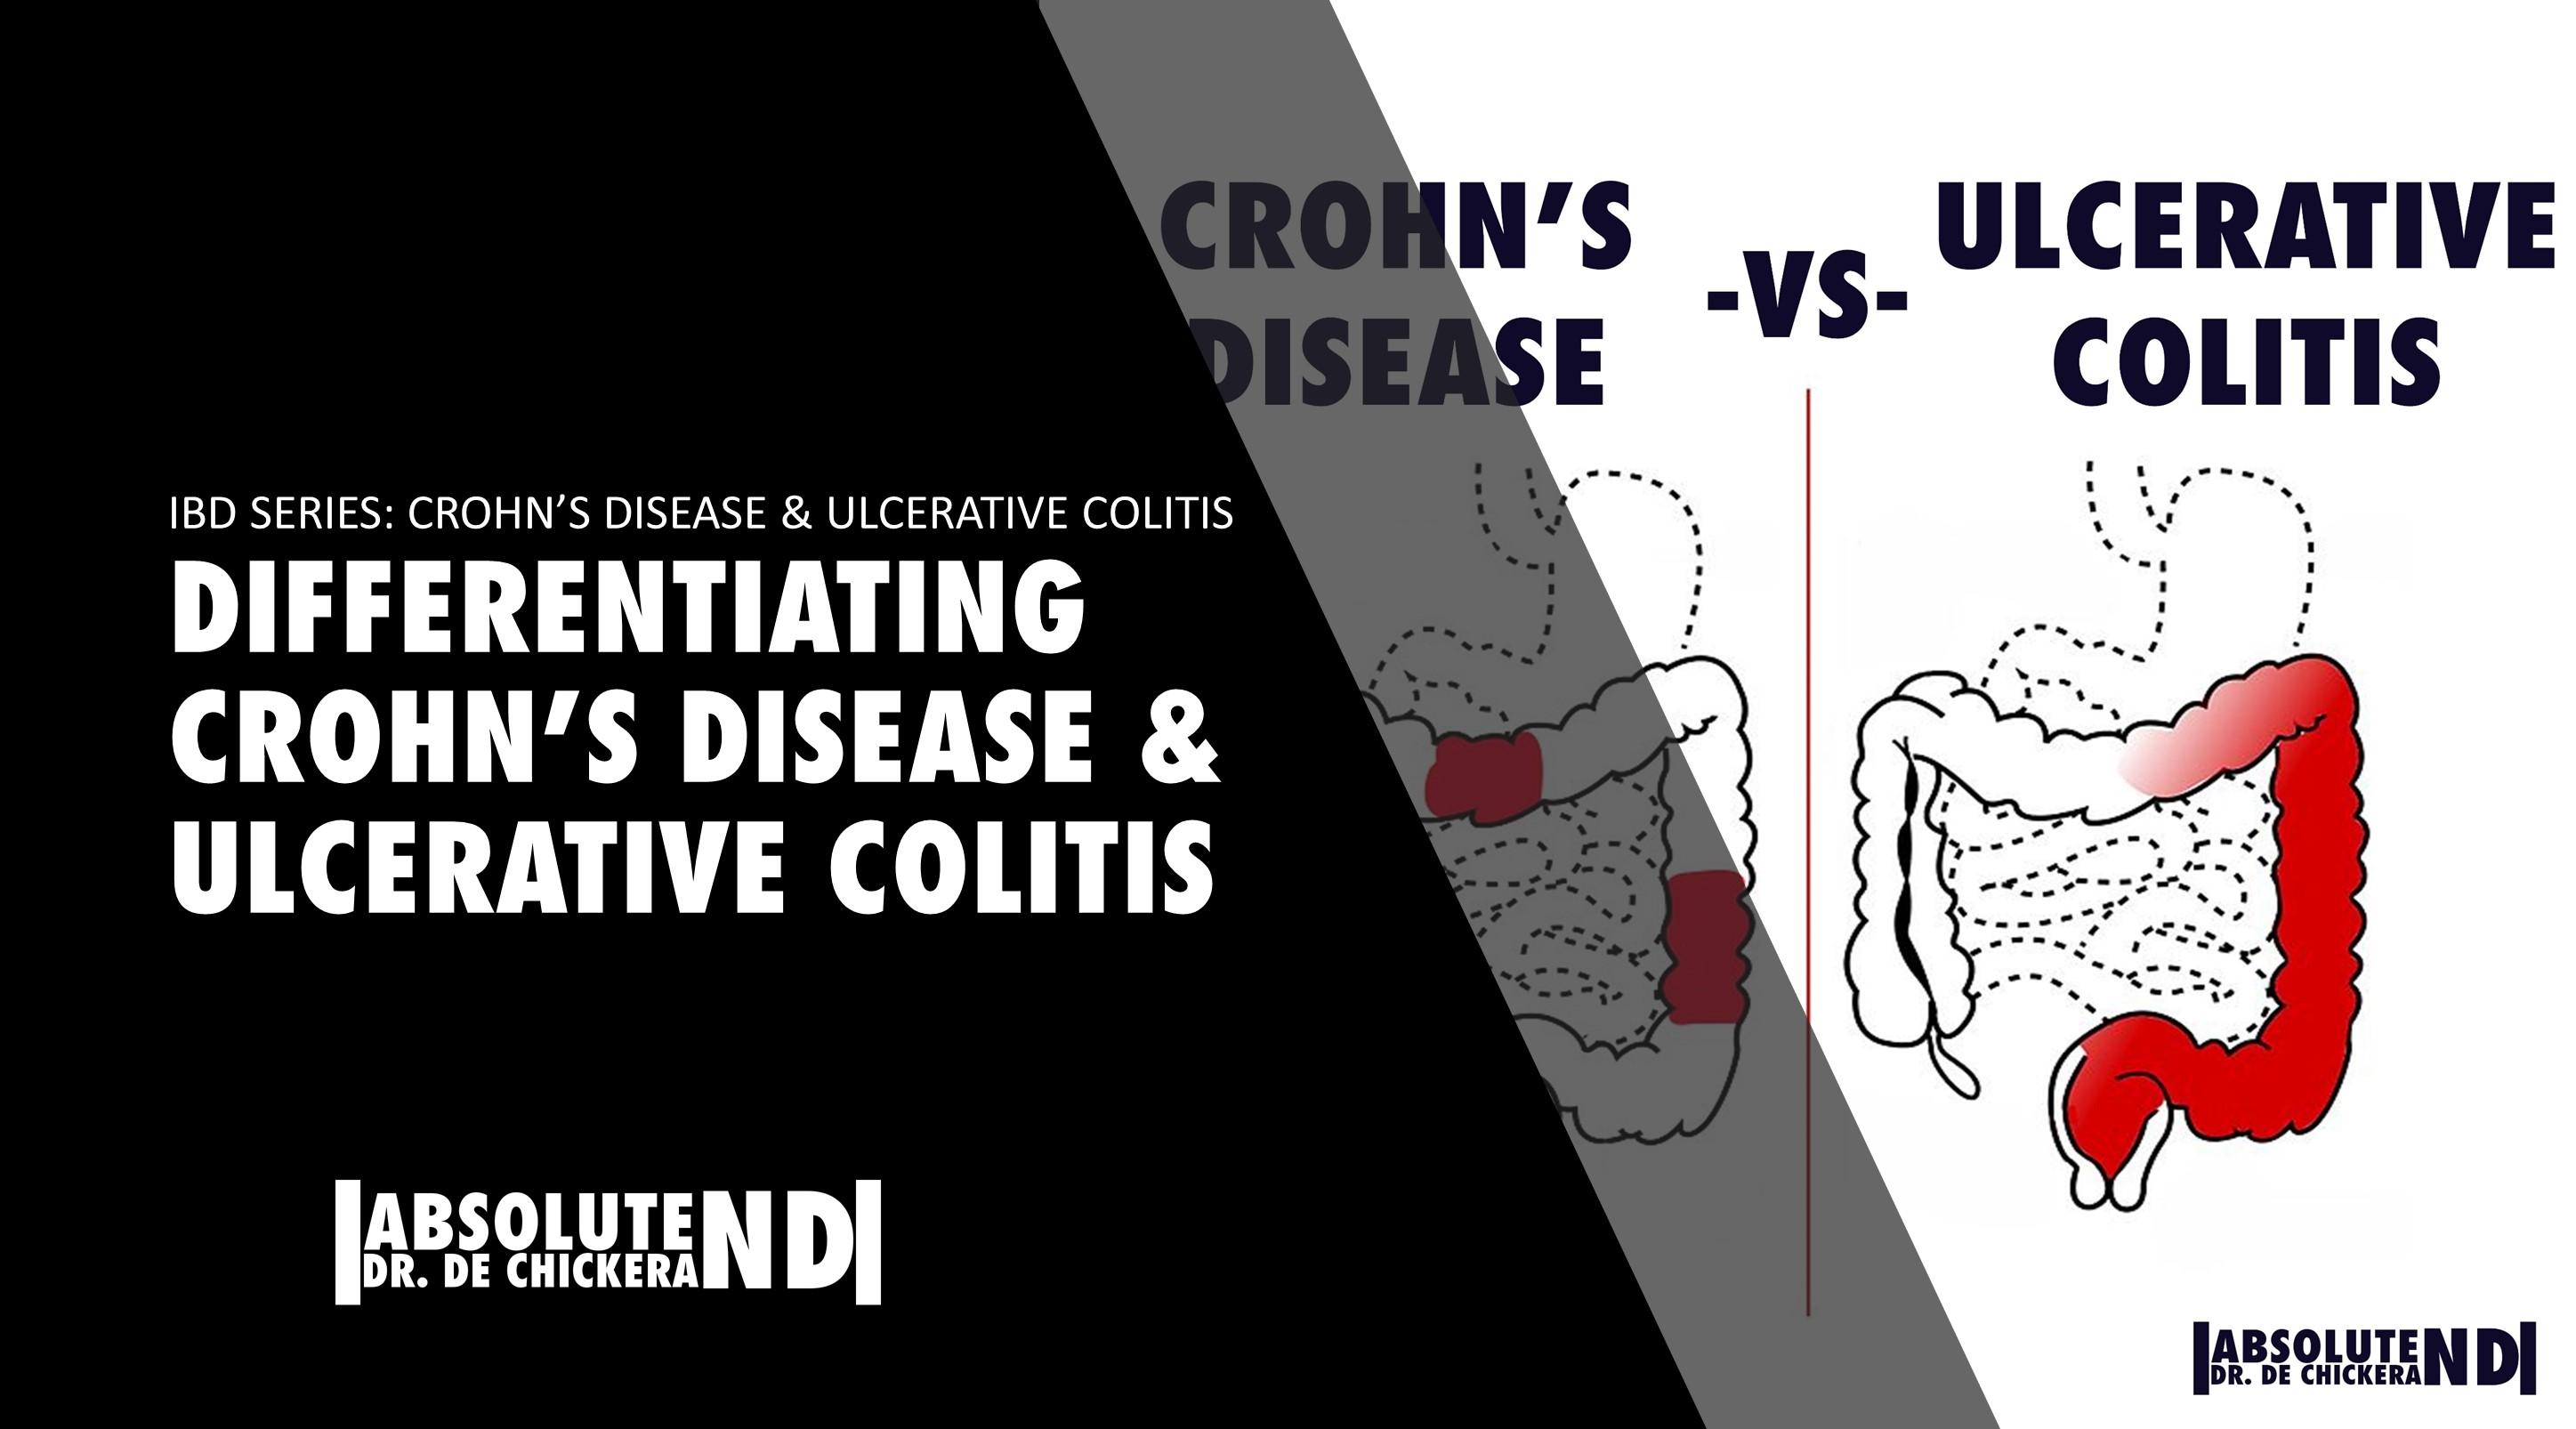 Autoimmune_IBD_CROHN'S AND COLITIS DIFFERENCES